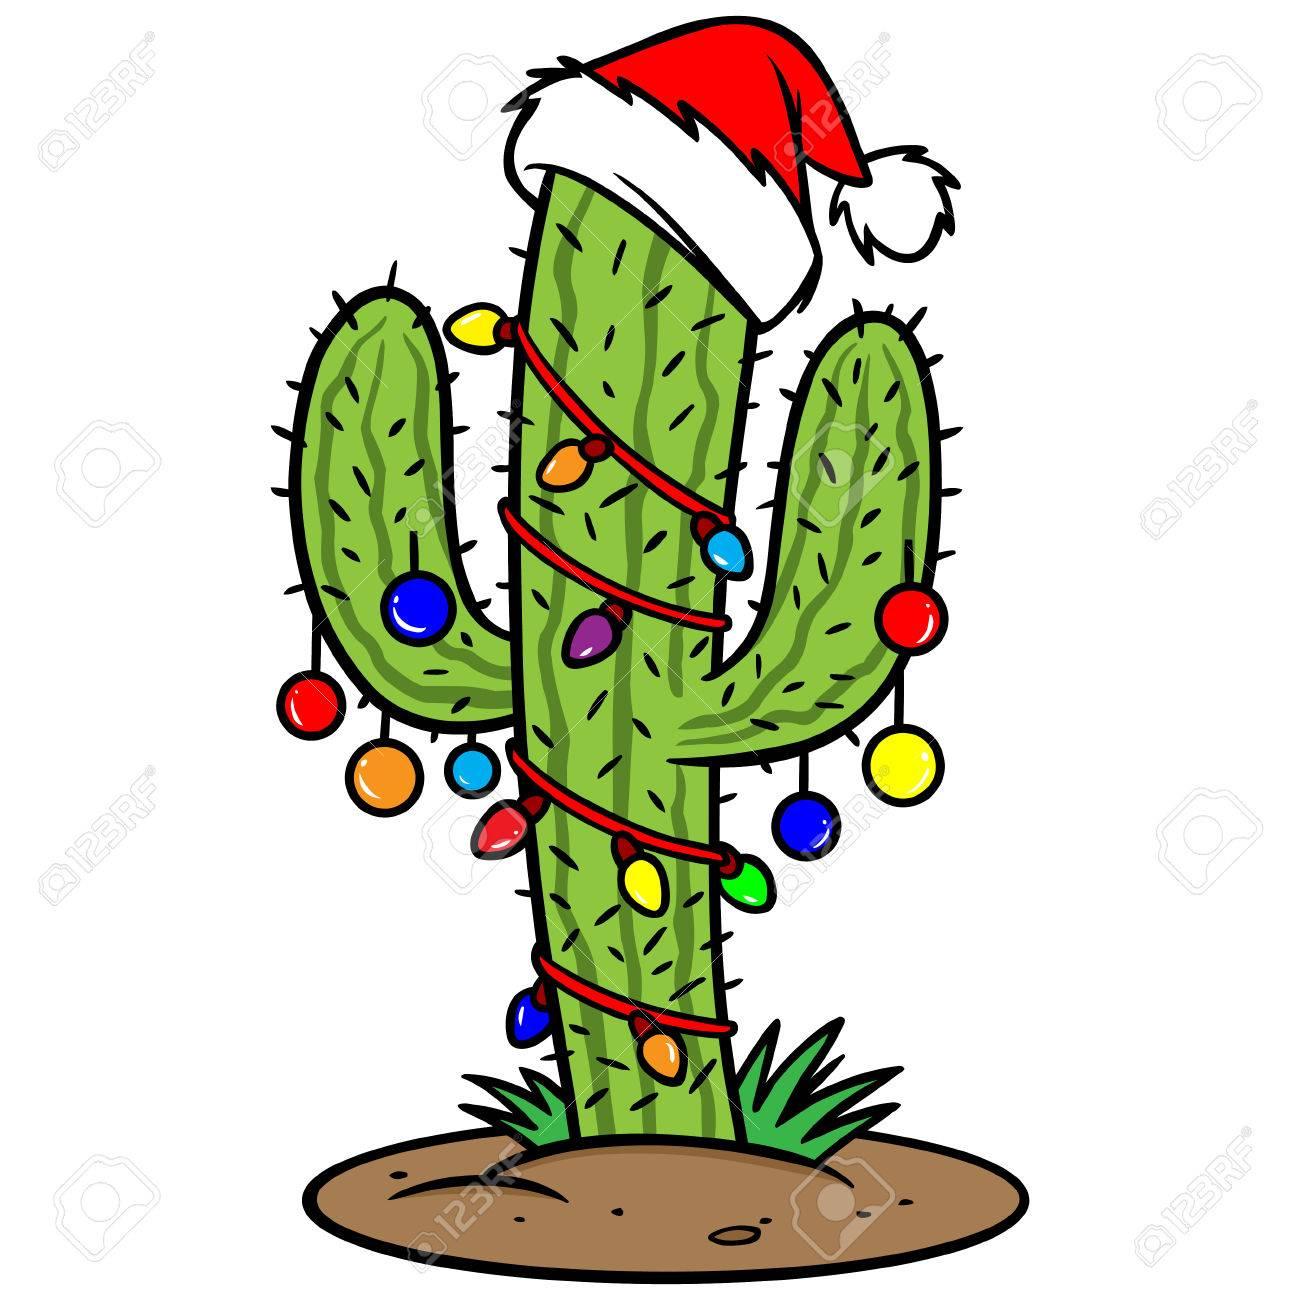 Christmas Cactus Clipart.Christmas Cactus